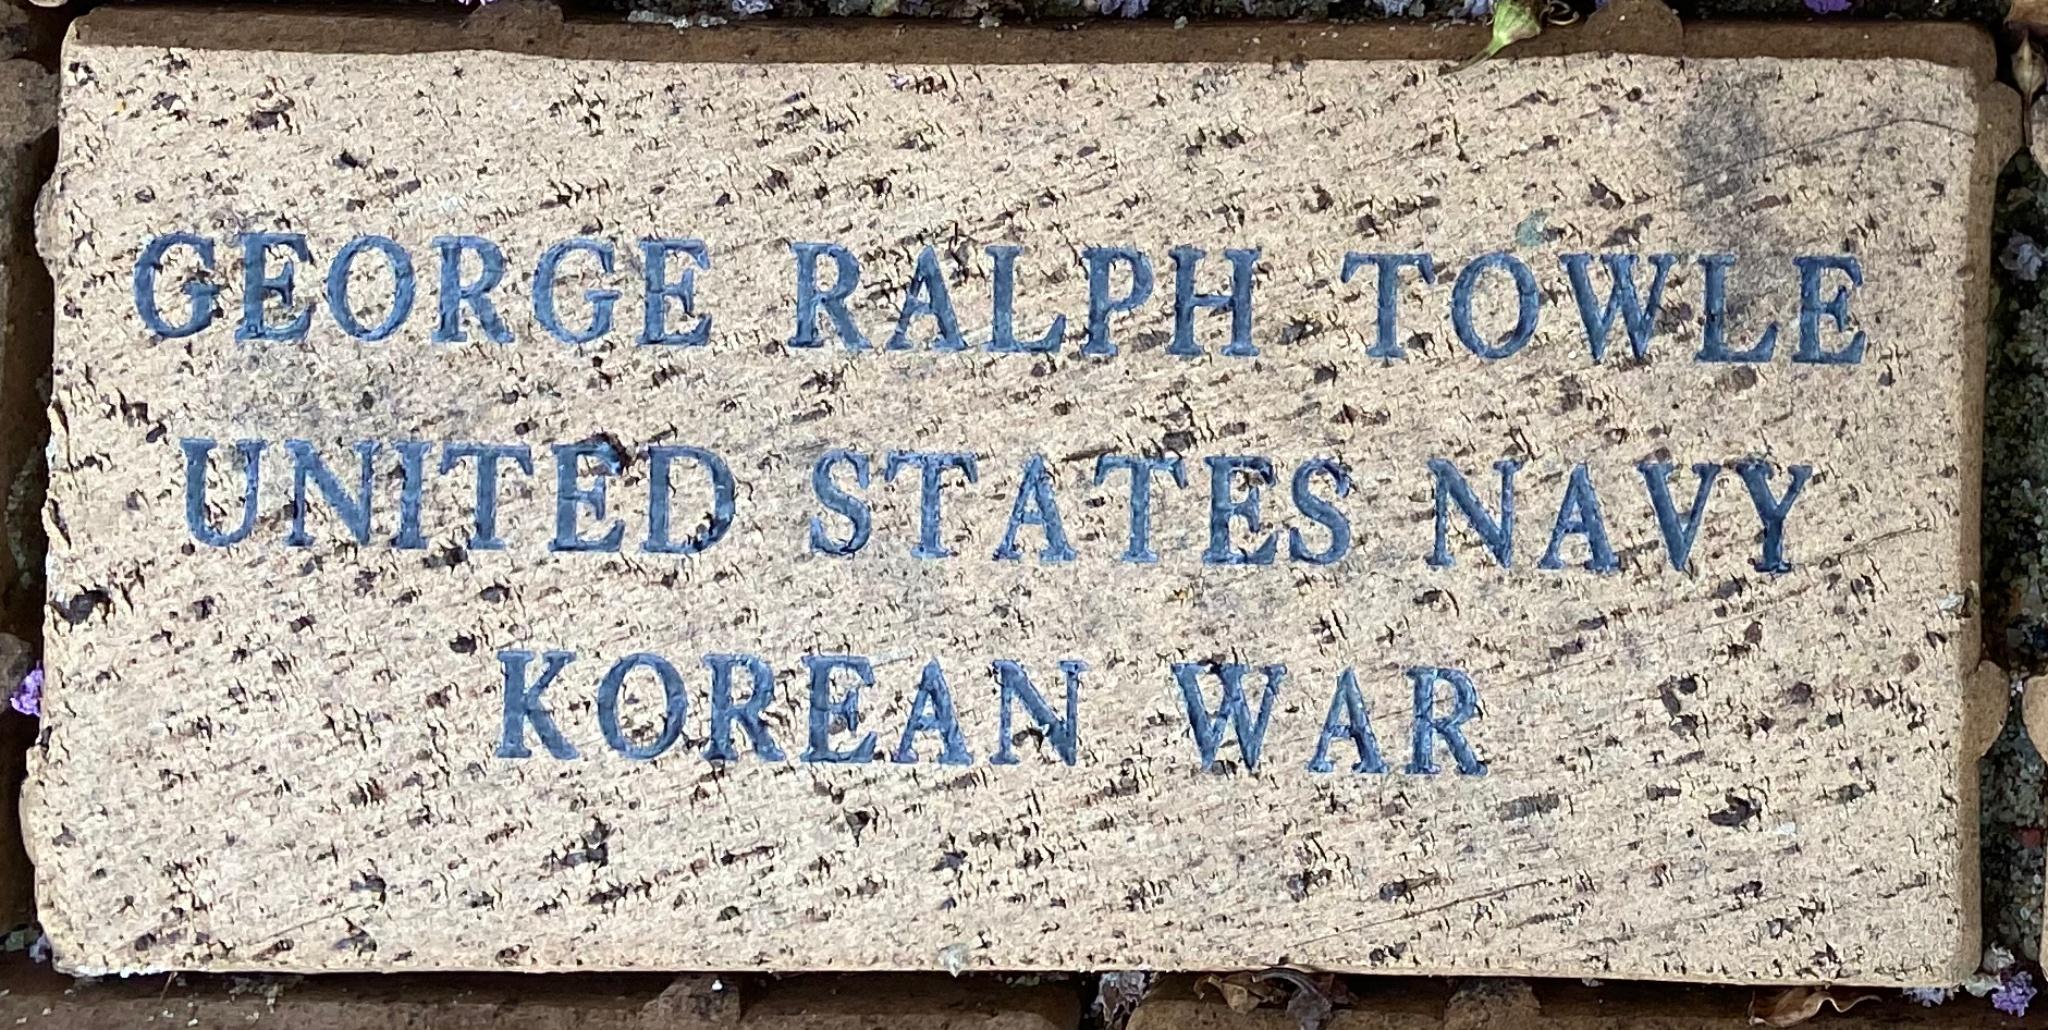 GEORGE RALPH TOWLE UNITED STATES NAVY KOREAN WAR